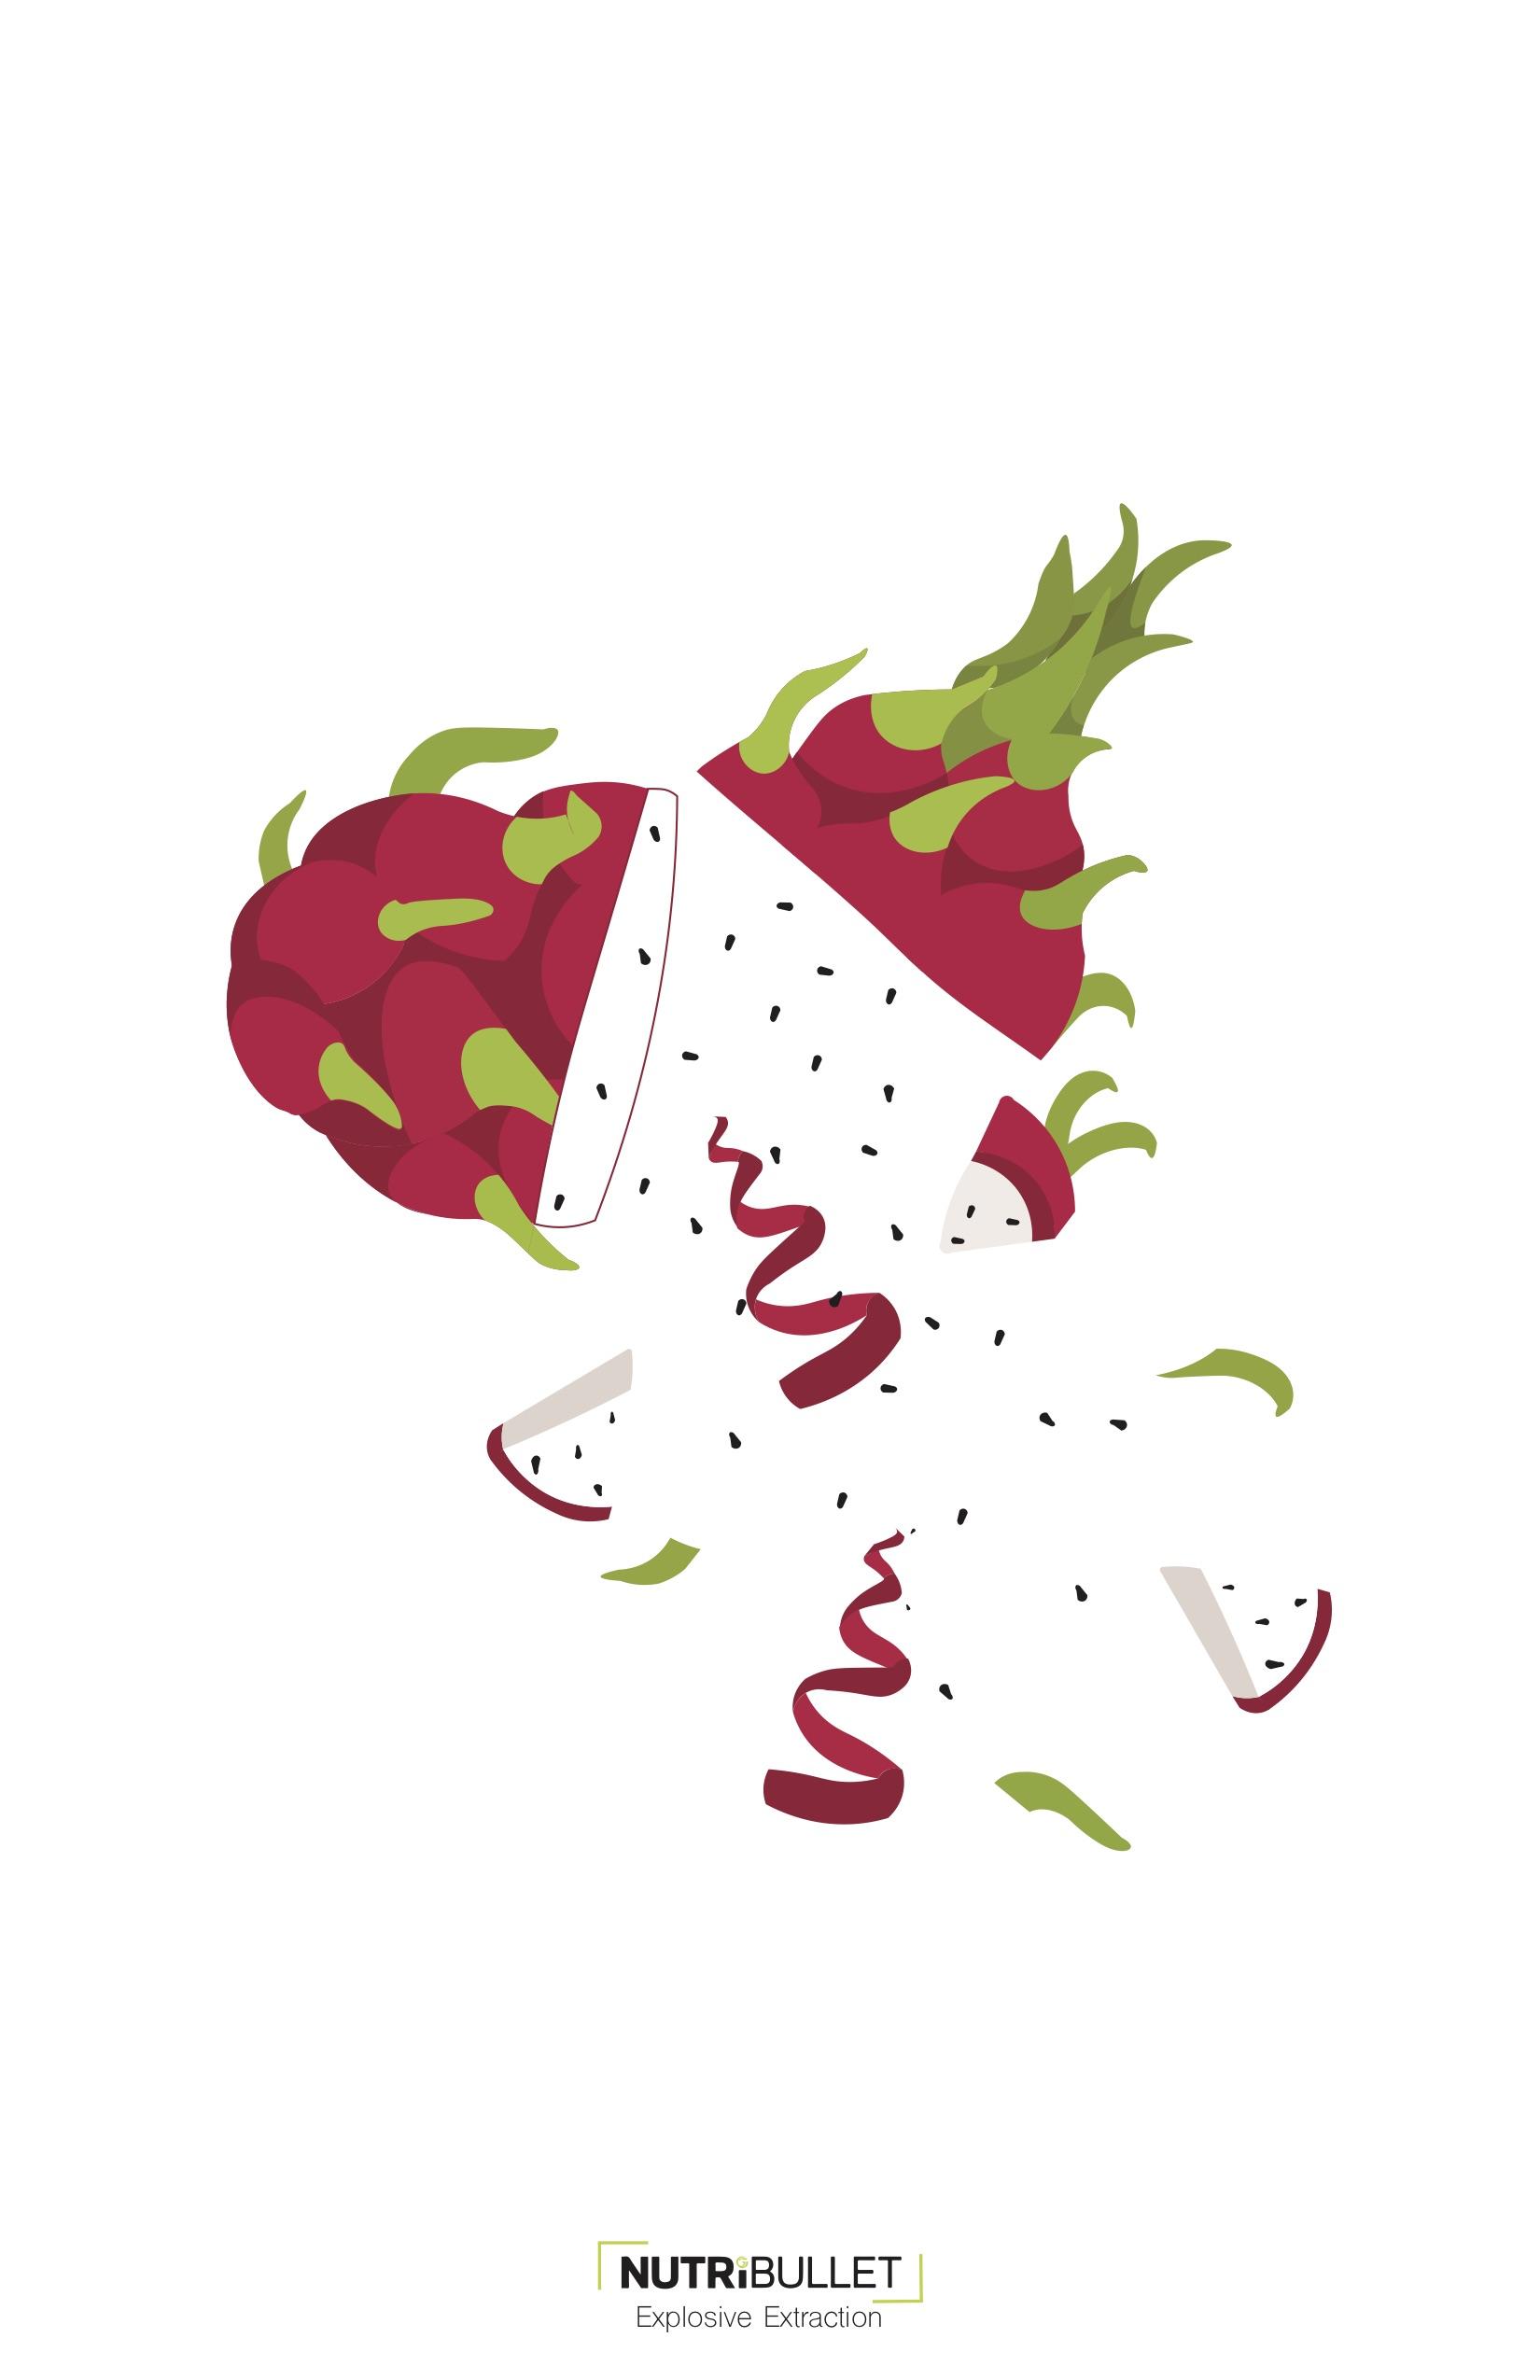 Nutribullet Dragon Fruit with lines.jpg